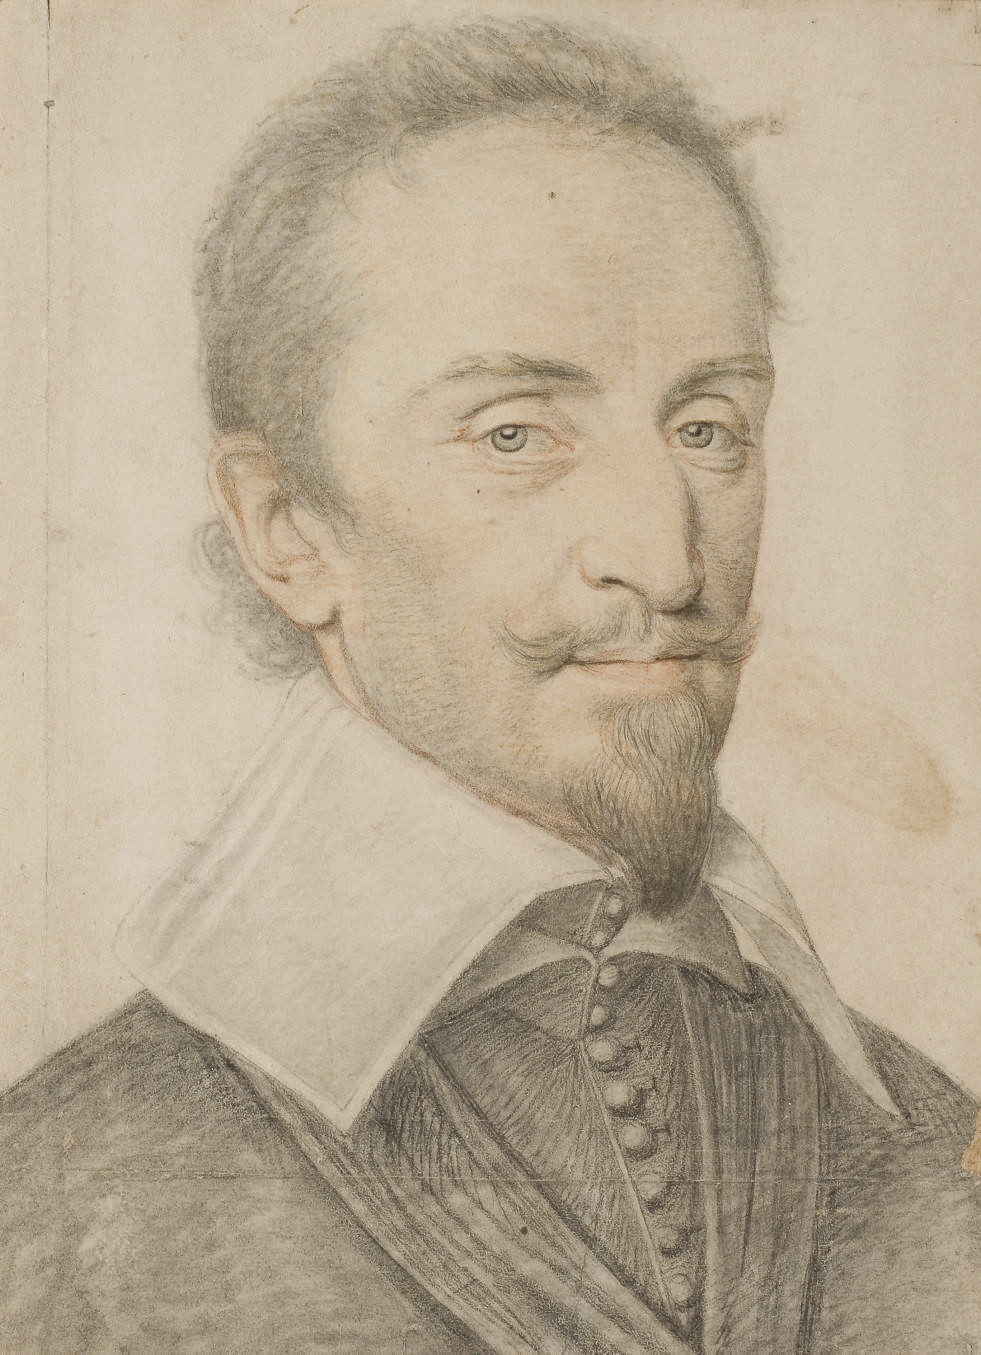 DANIEL DUMONSTIER (PARIS 1574-